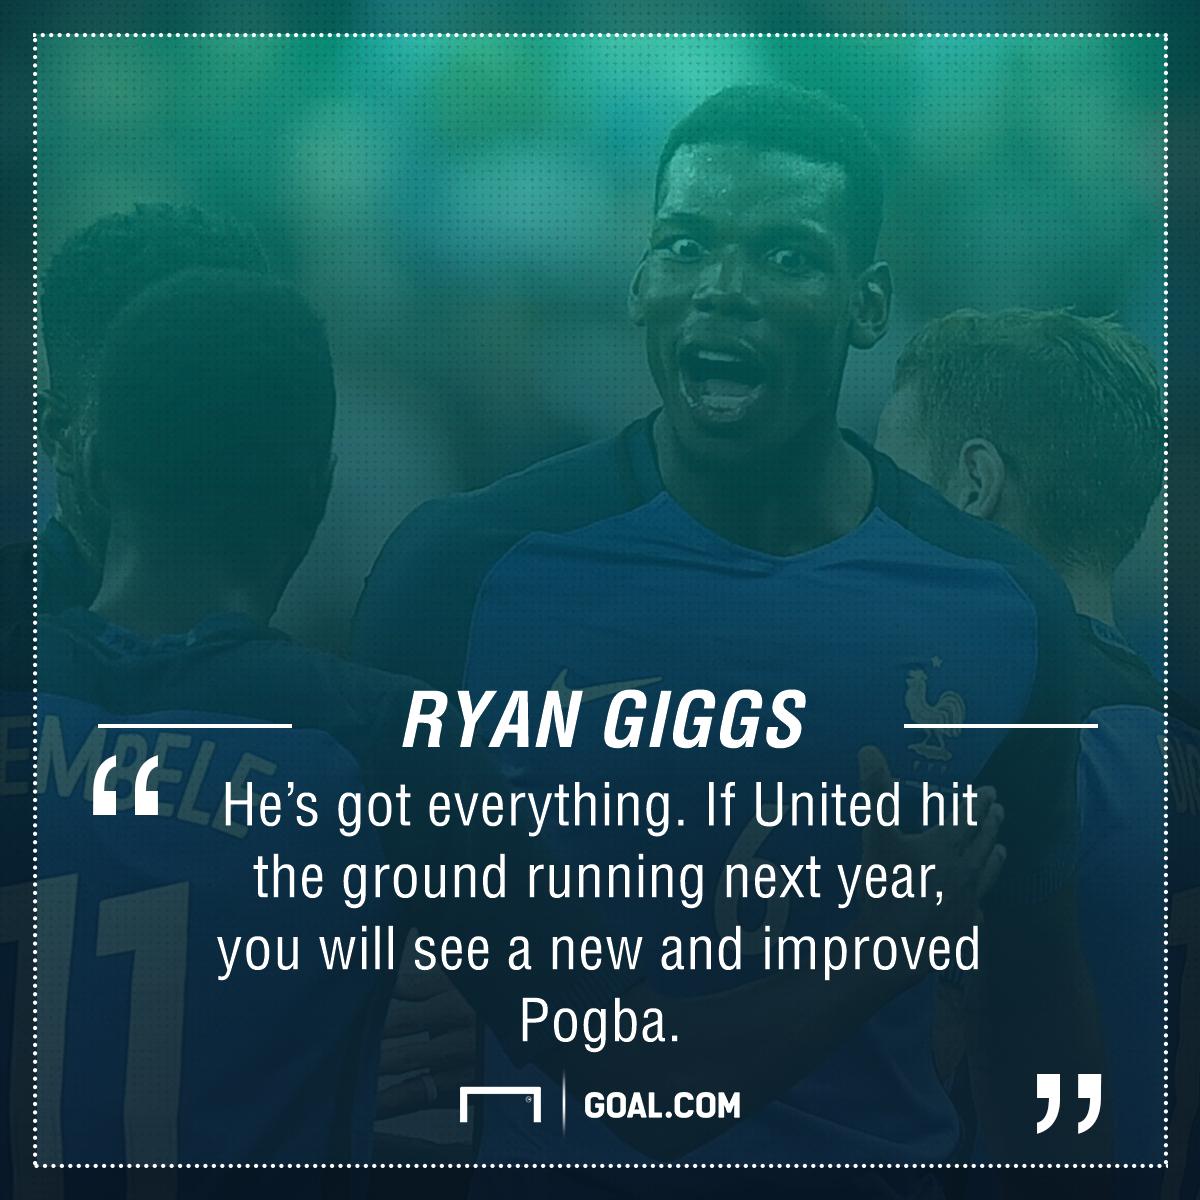 Ryan Giggs Paul Pogba